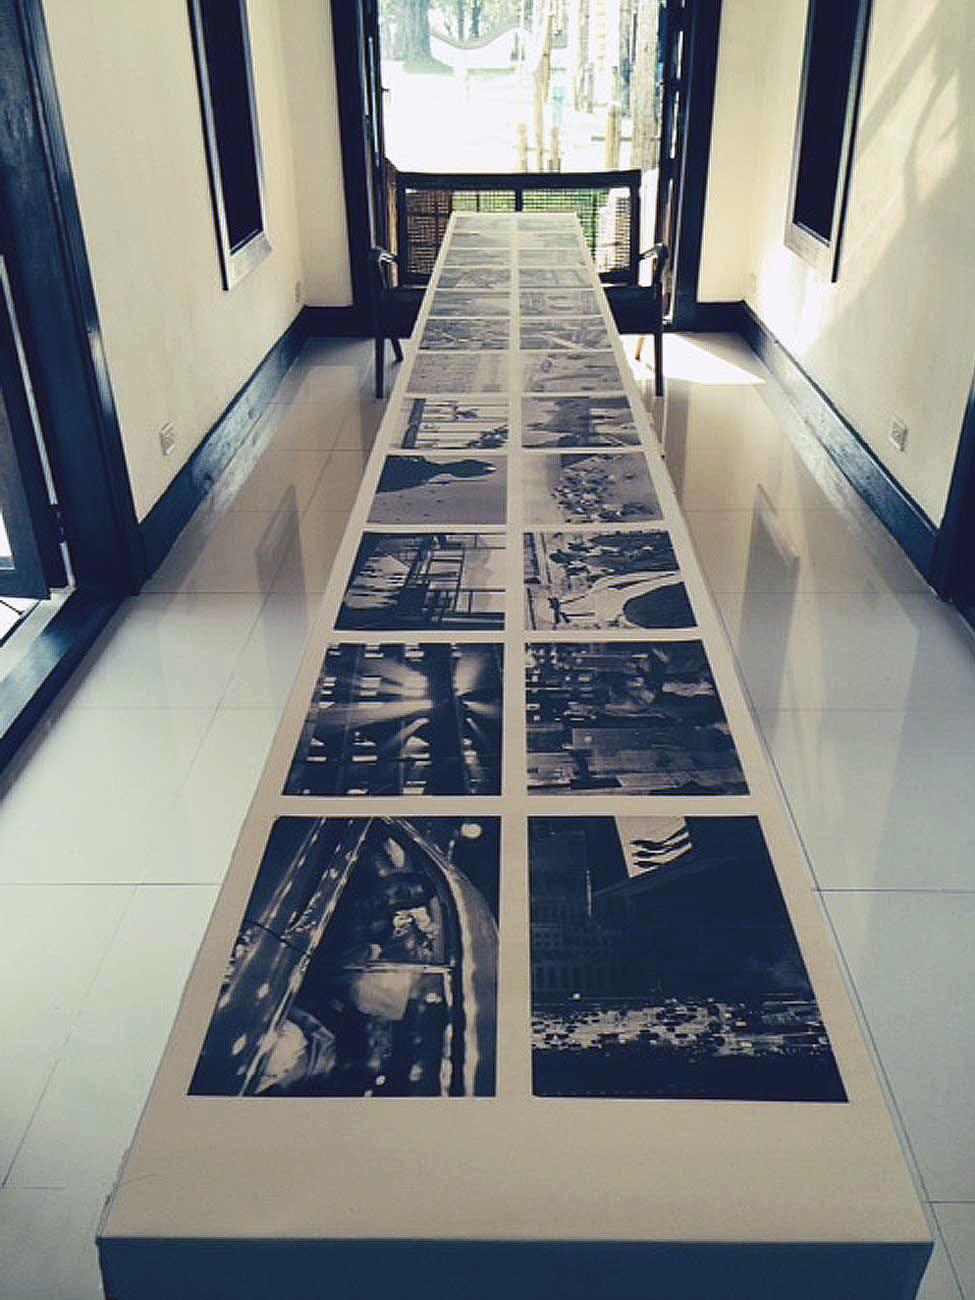 Exhibition_RenéBurri_©loup.ch_3